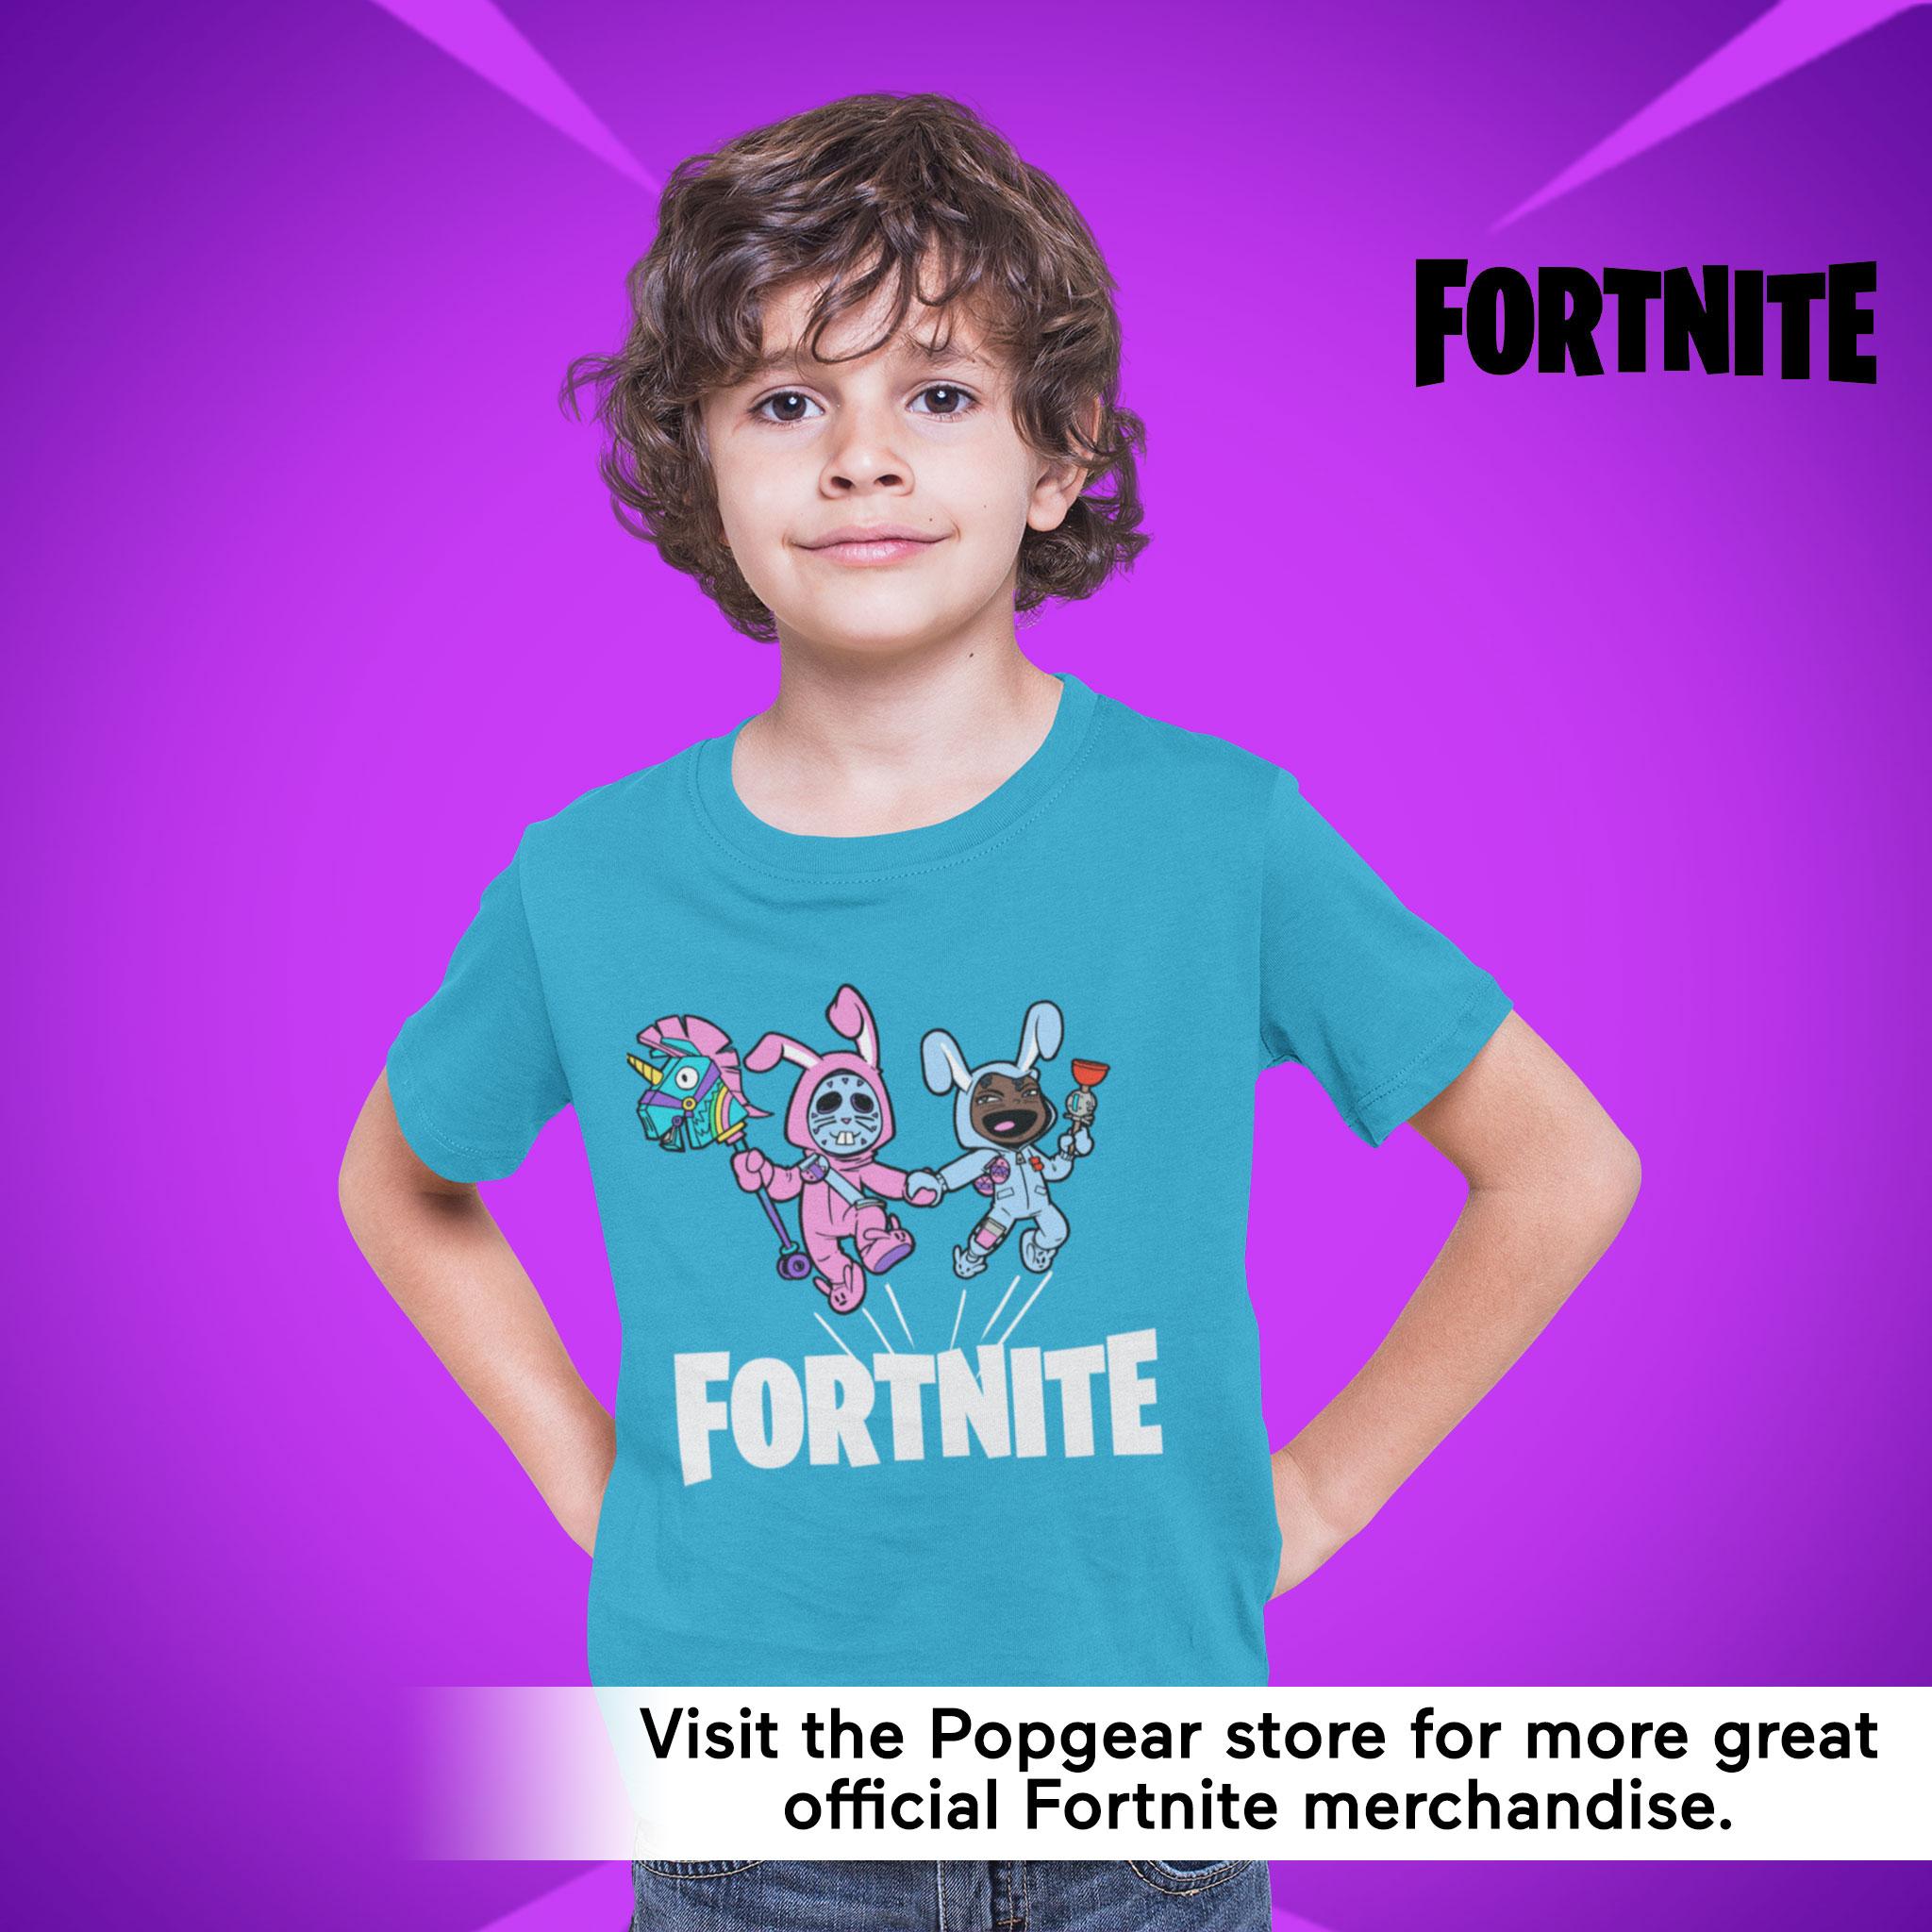 miniature 8 - Boys Fortnite T Shirt Bunny Trouble Official Merchandise